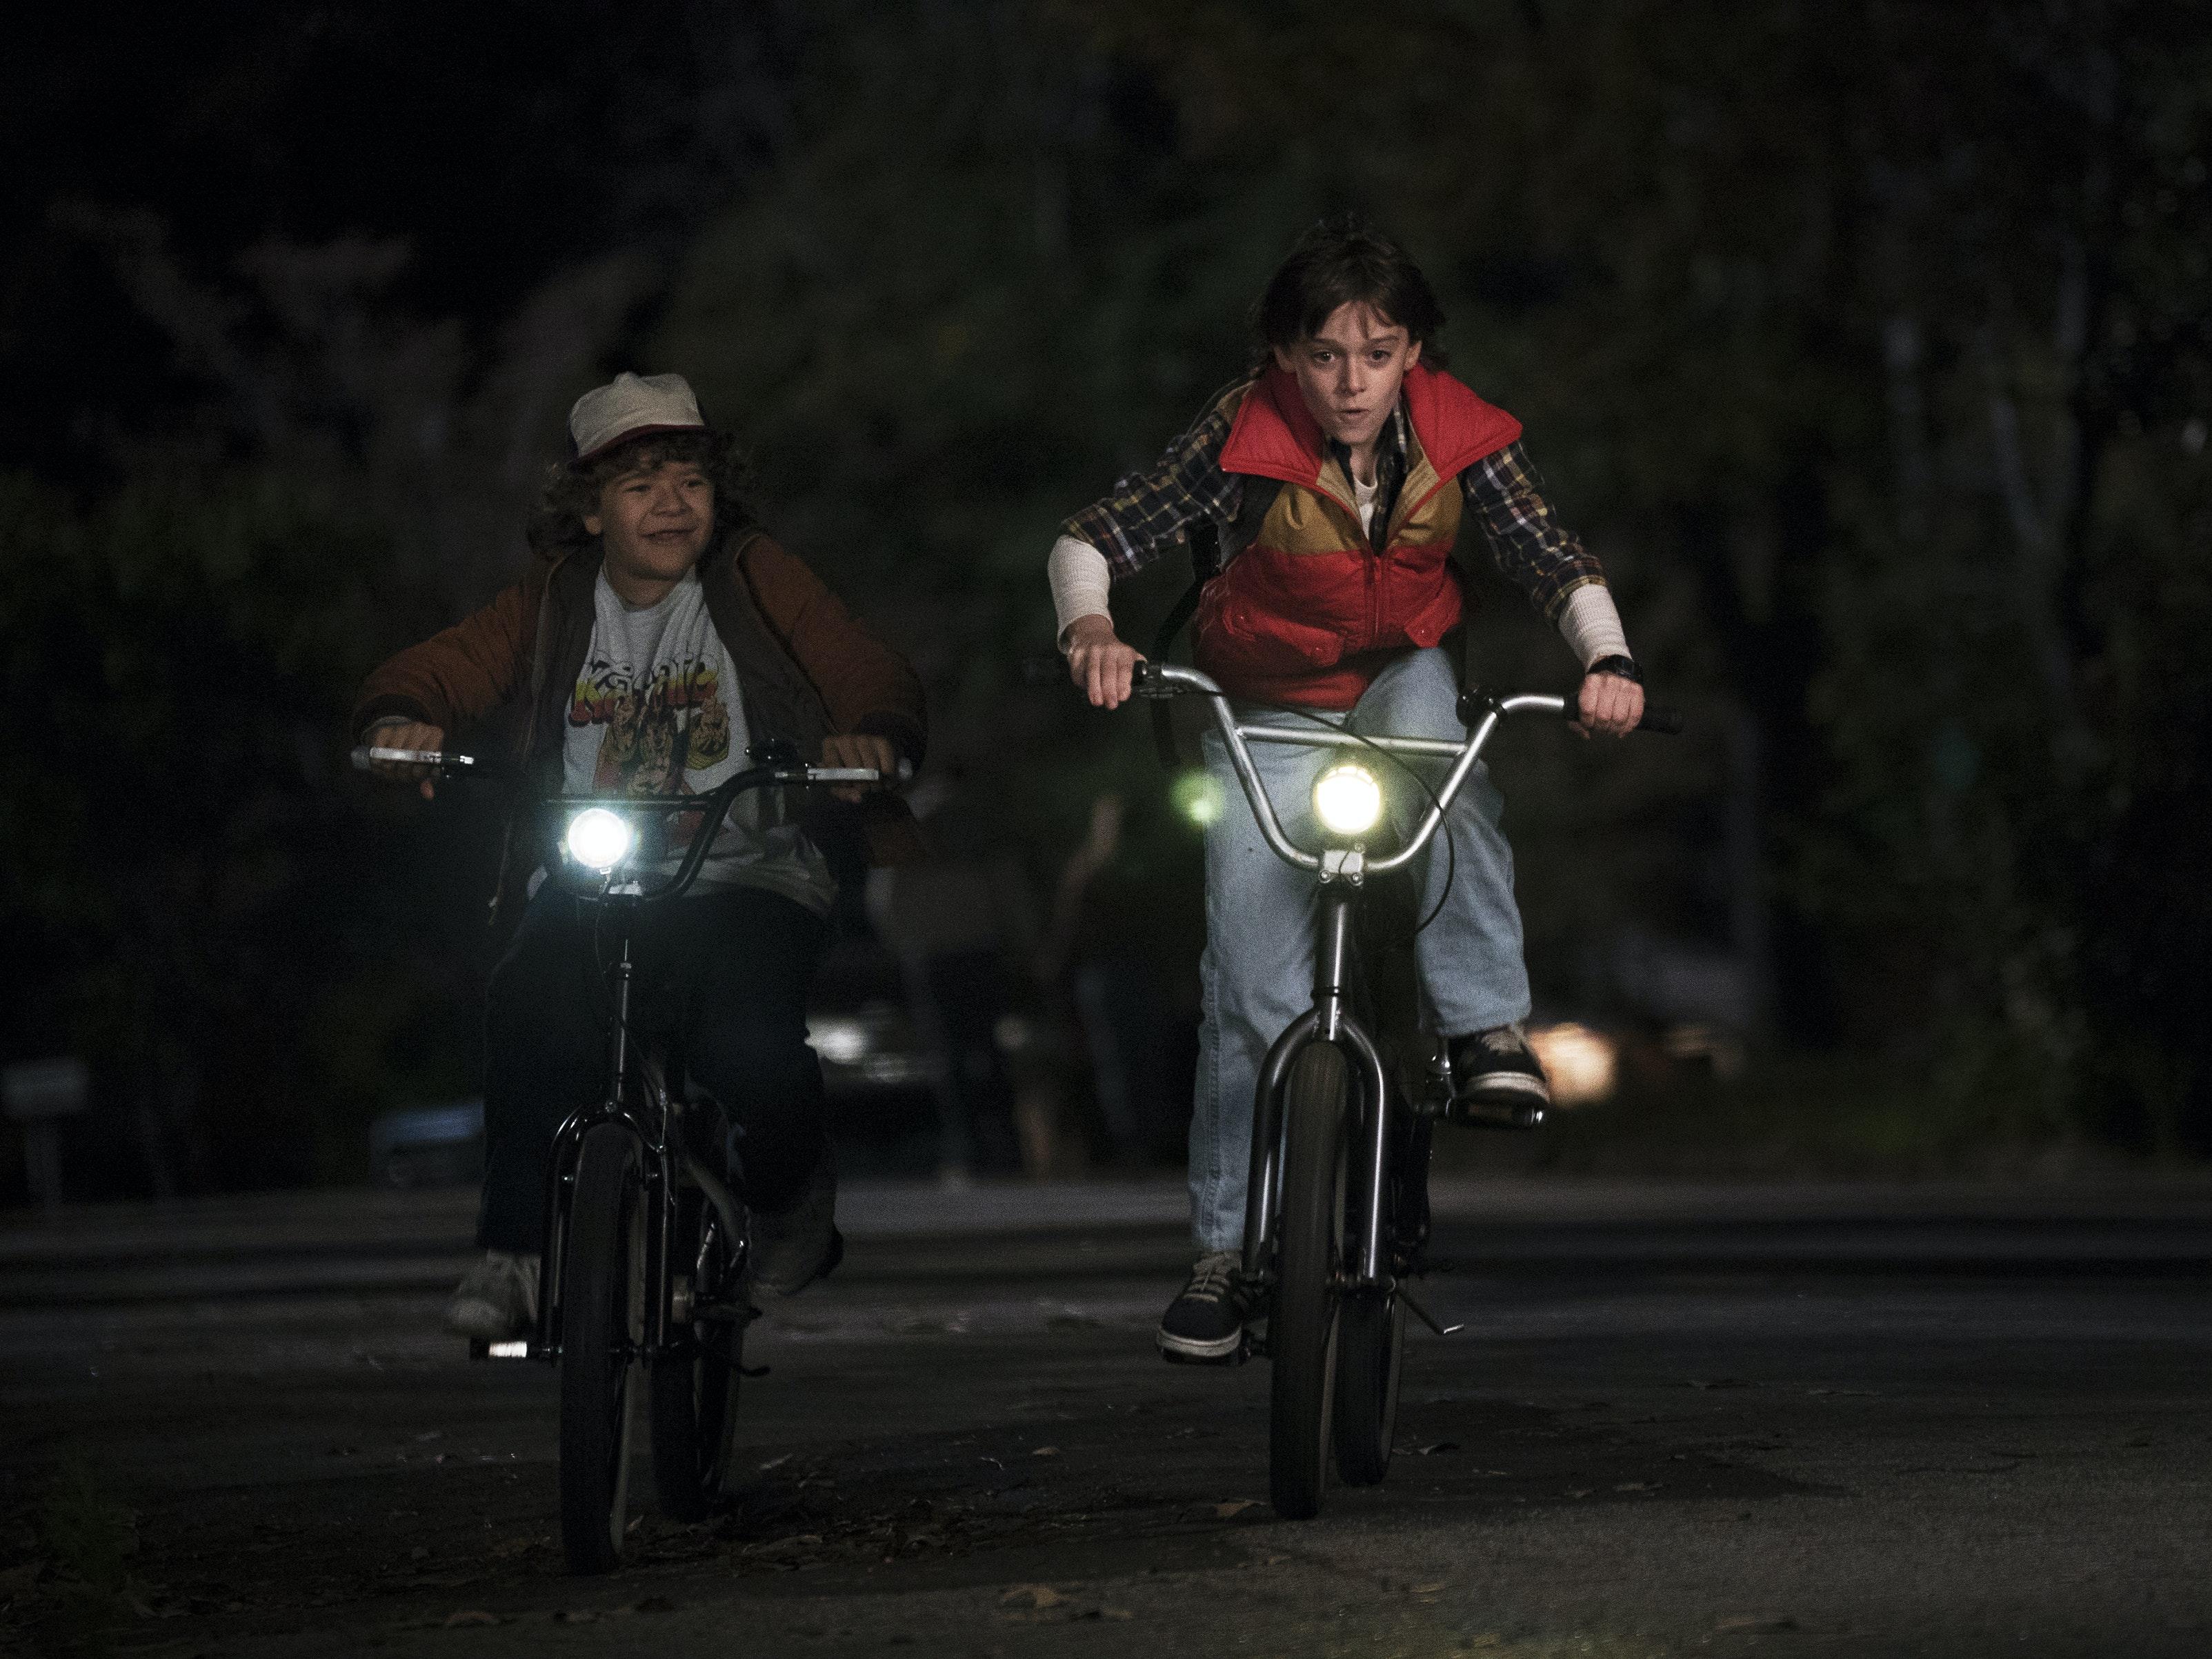 BMX Bikes as Symbols of Childhood Freedom on 'Stranger Things'